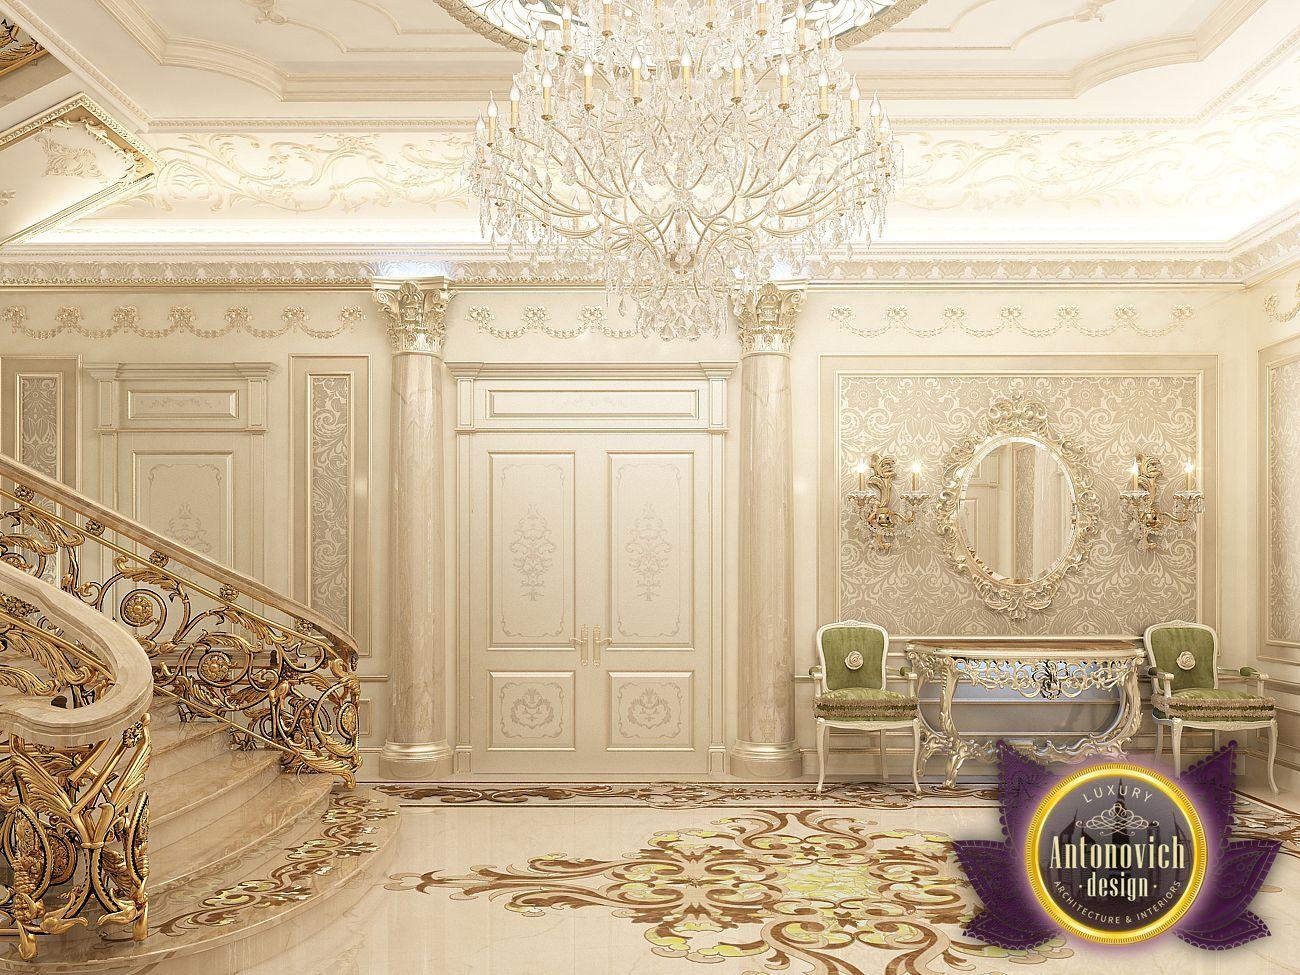 Kitchens dubai from antonovich design - Dream Interior Of Luxury Antonovich Design Katrina Antonovich